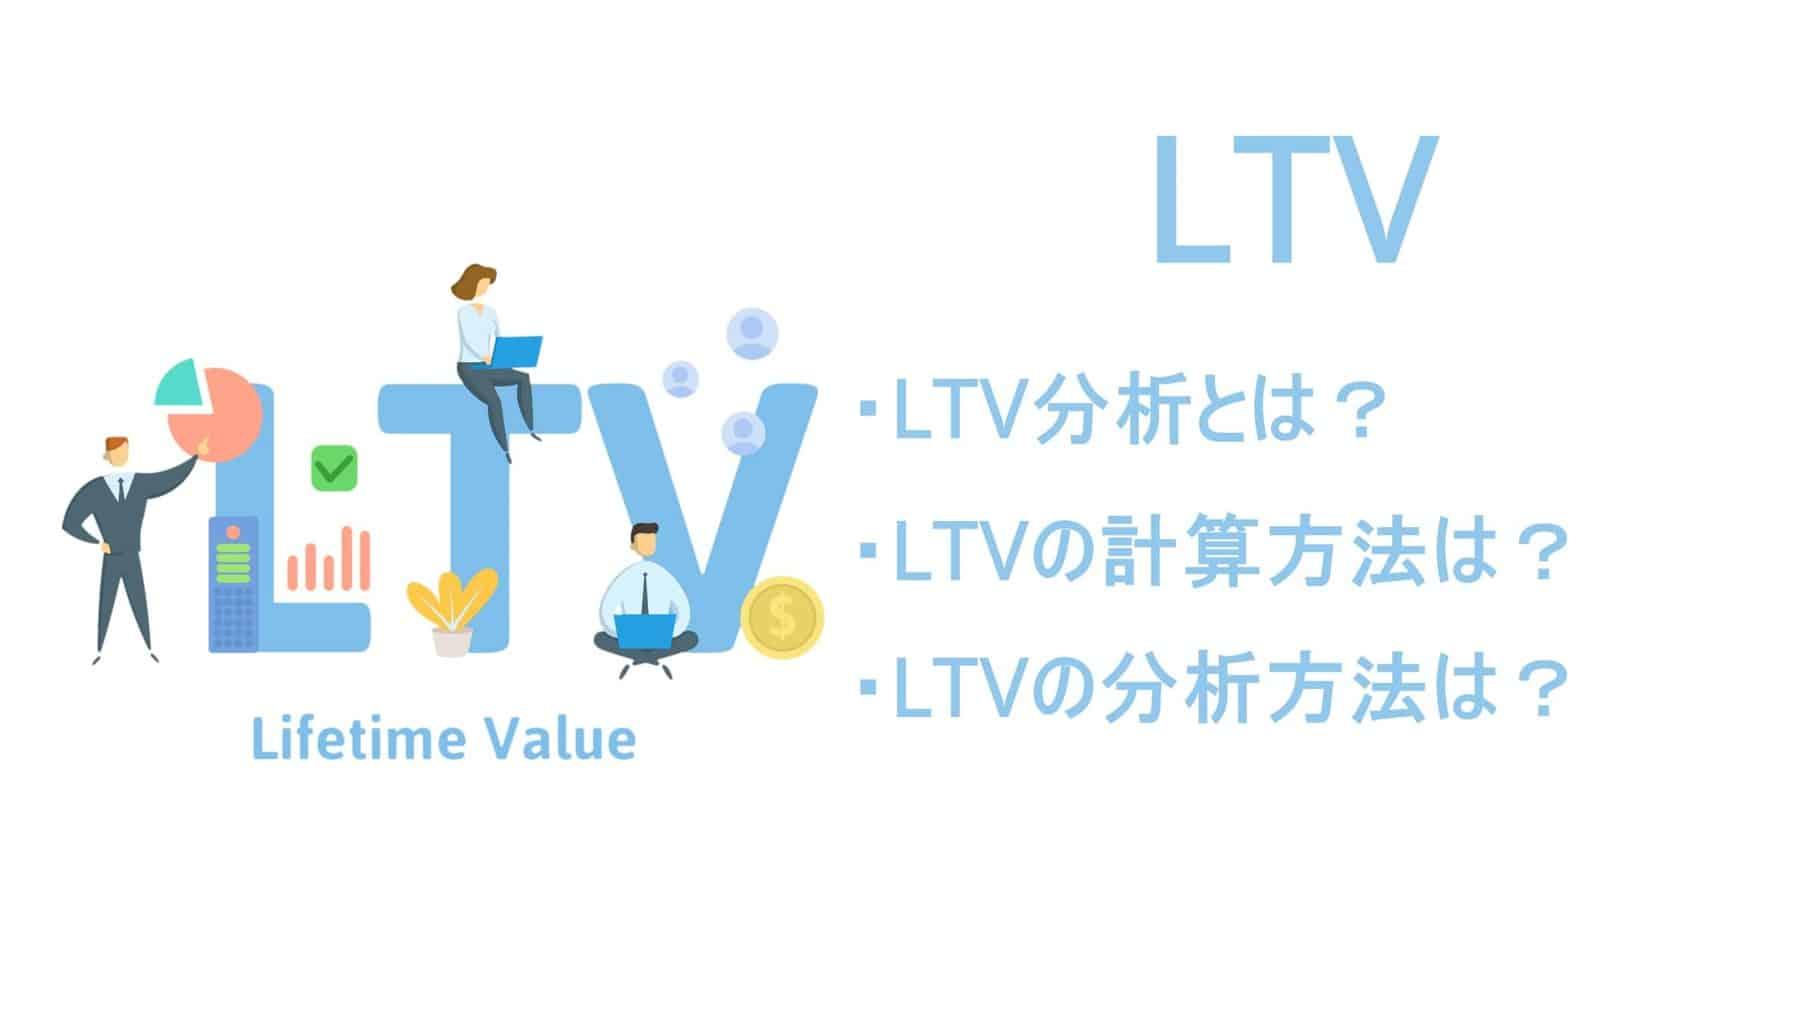 LTV分析とは?LTV分析の必要性や計算方法・分析方法なども紹介!